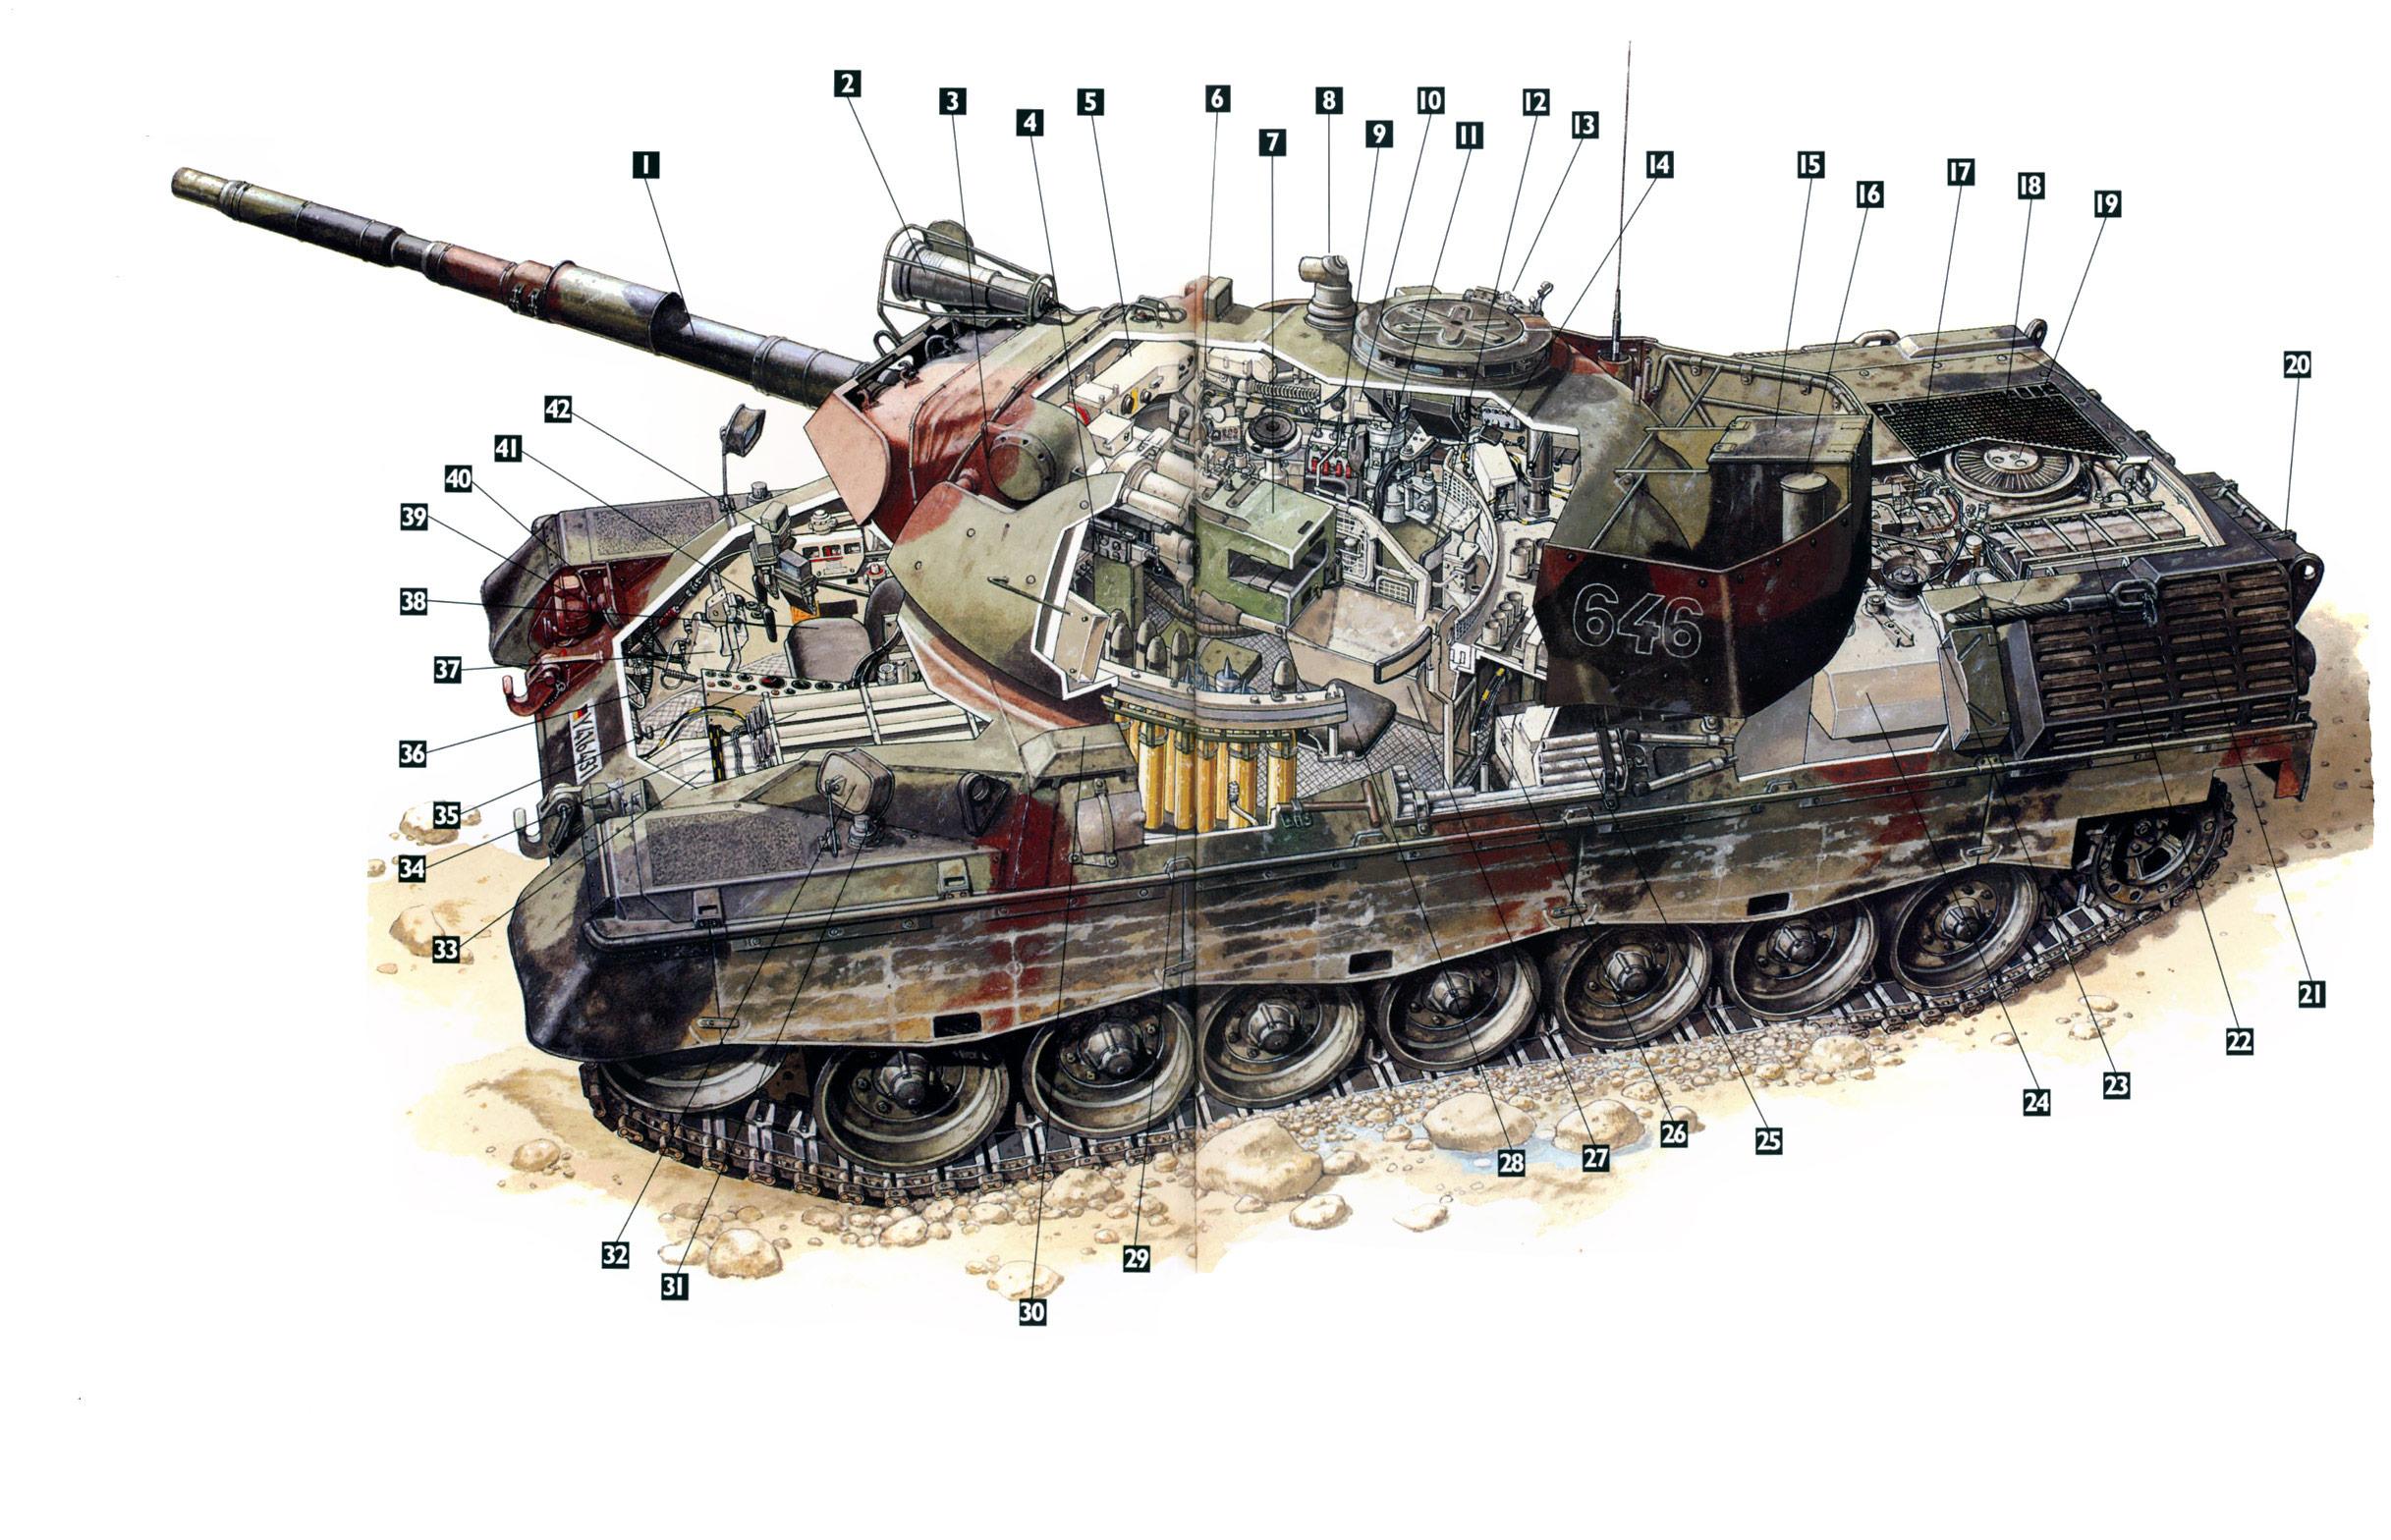 Leopard 1 cutaway